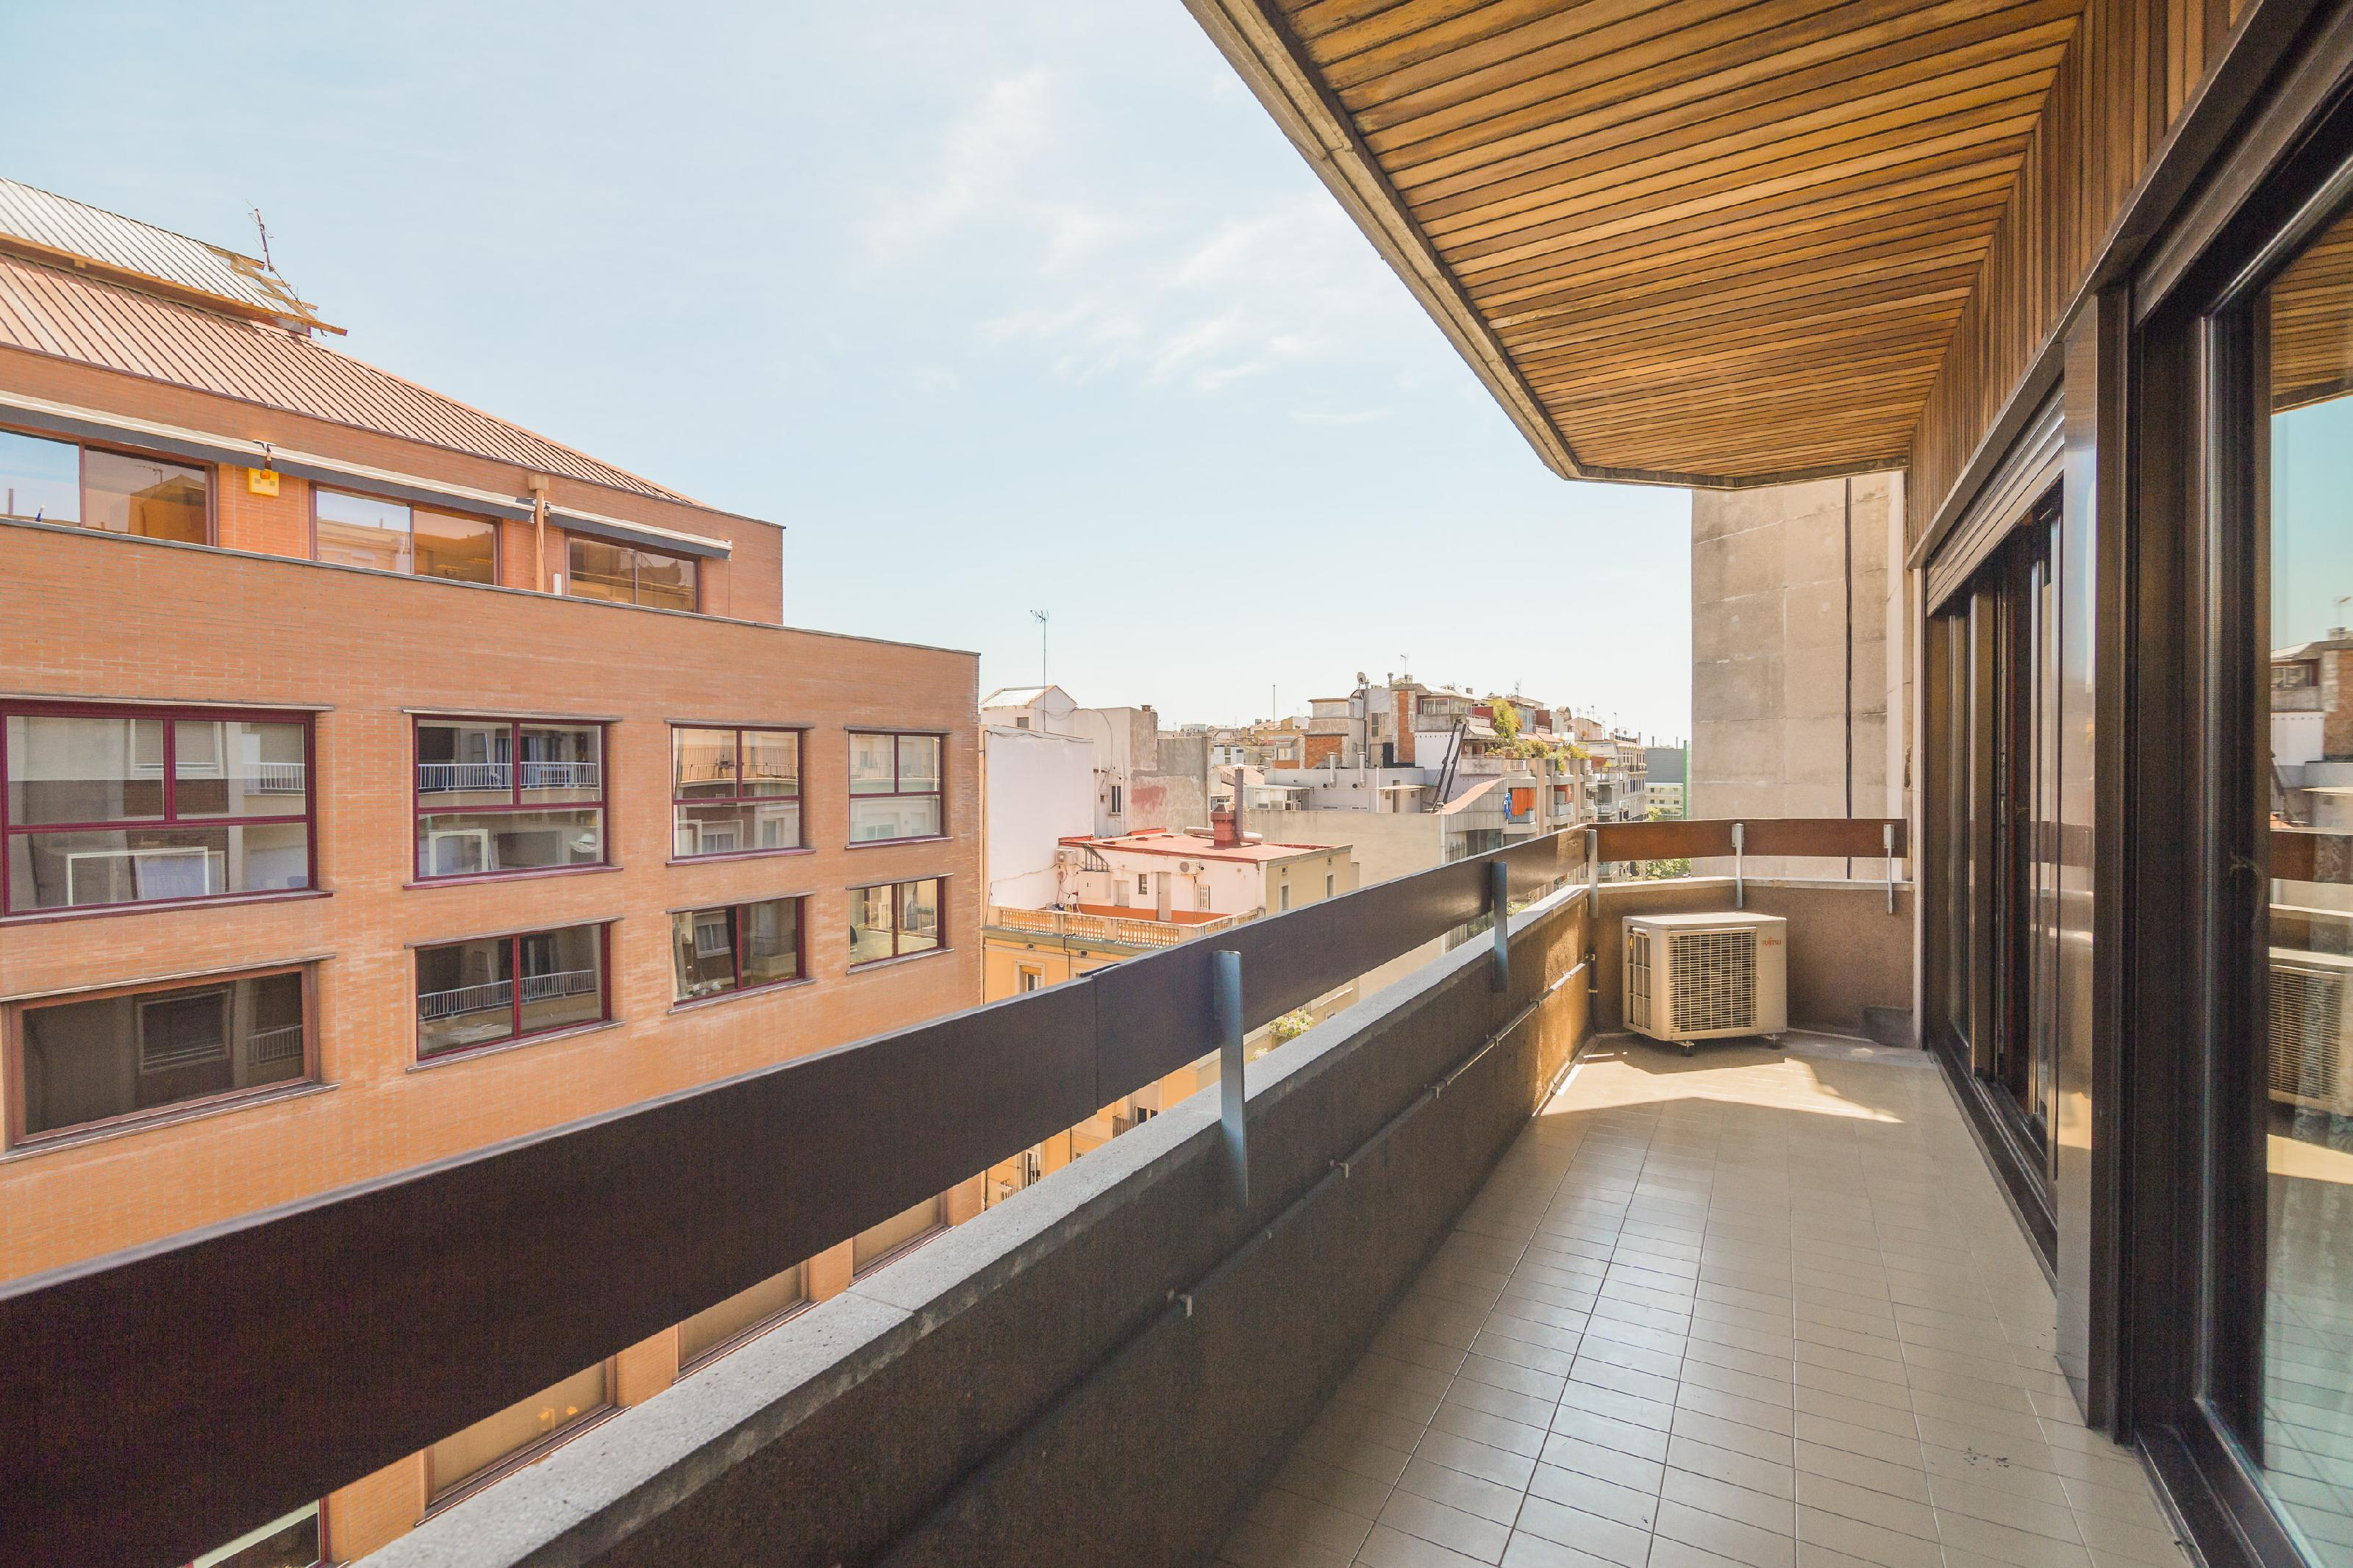 249856 Flat for sale in Sarrià-Sant Gervasi, Sant Gervasi-Galvany 6